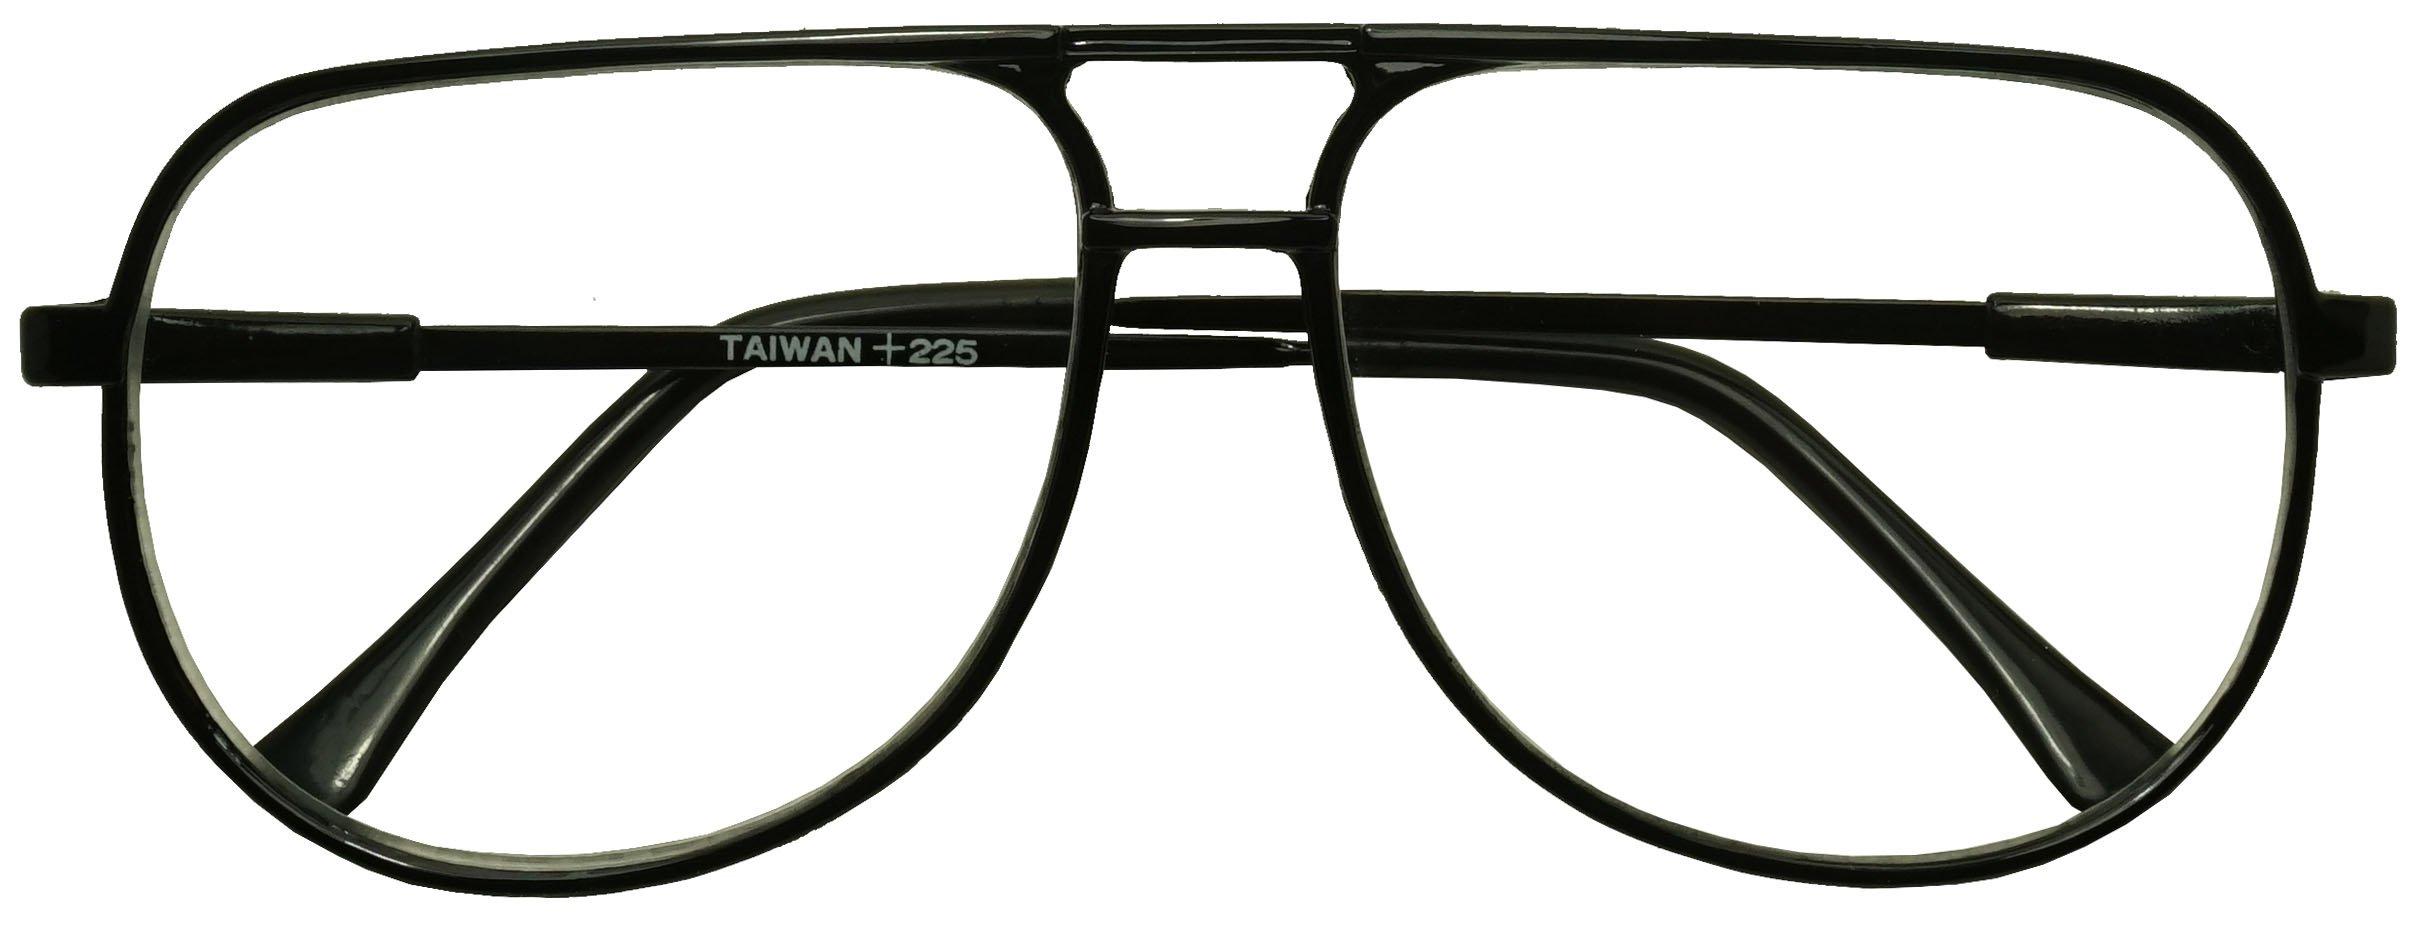 Classic 80s Vintage Oversized Optic Prescription Aviator Reading Eye Glasses Power +100 thru +325 (Black (Bi-Focal), 2.25)